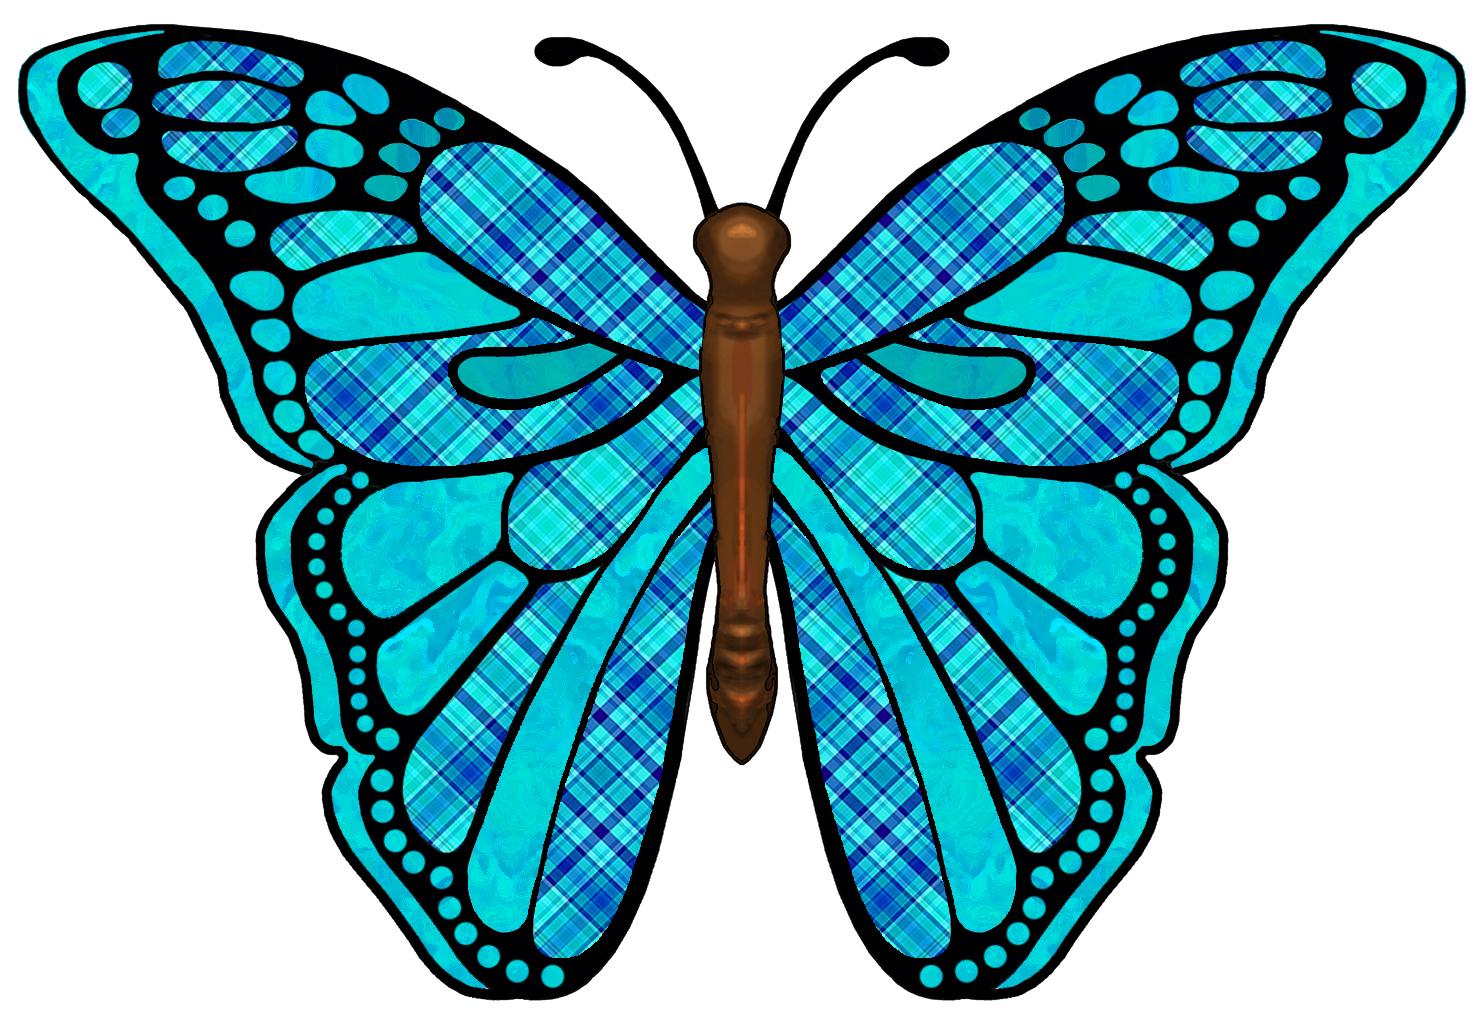 1484x1026 Symmetry clipart butterfly